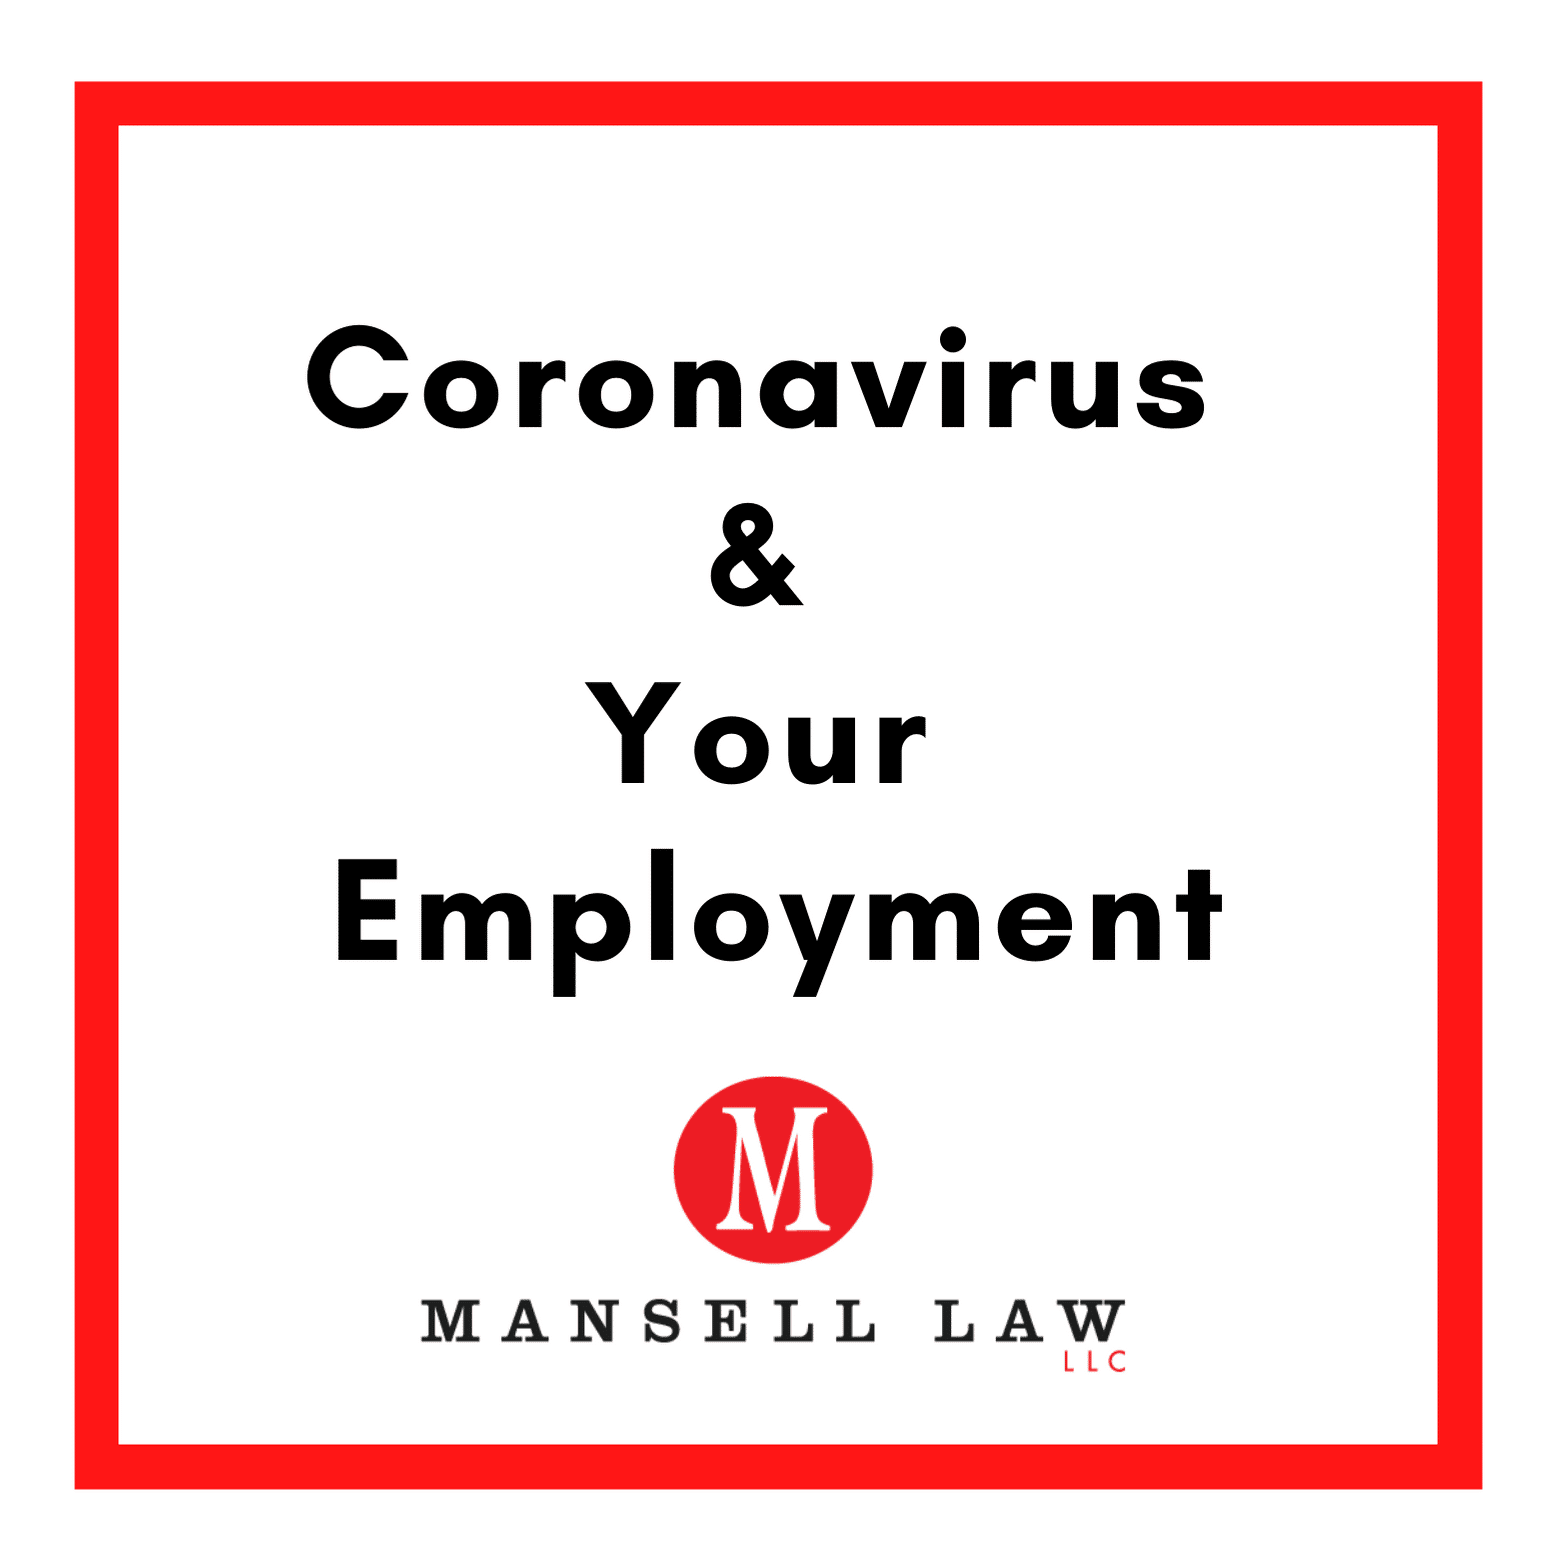 Corona virus and employment laws